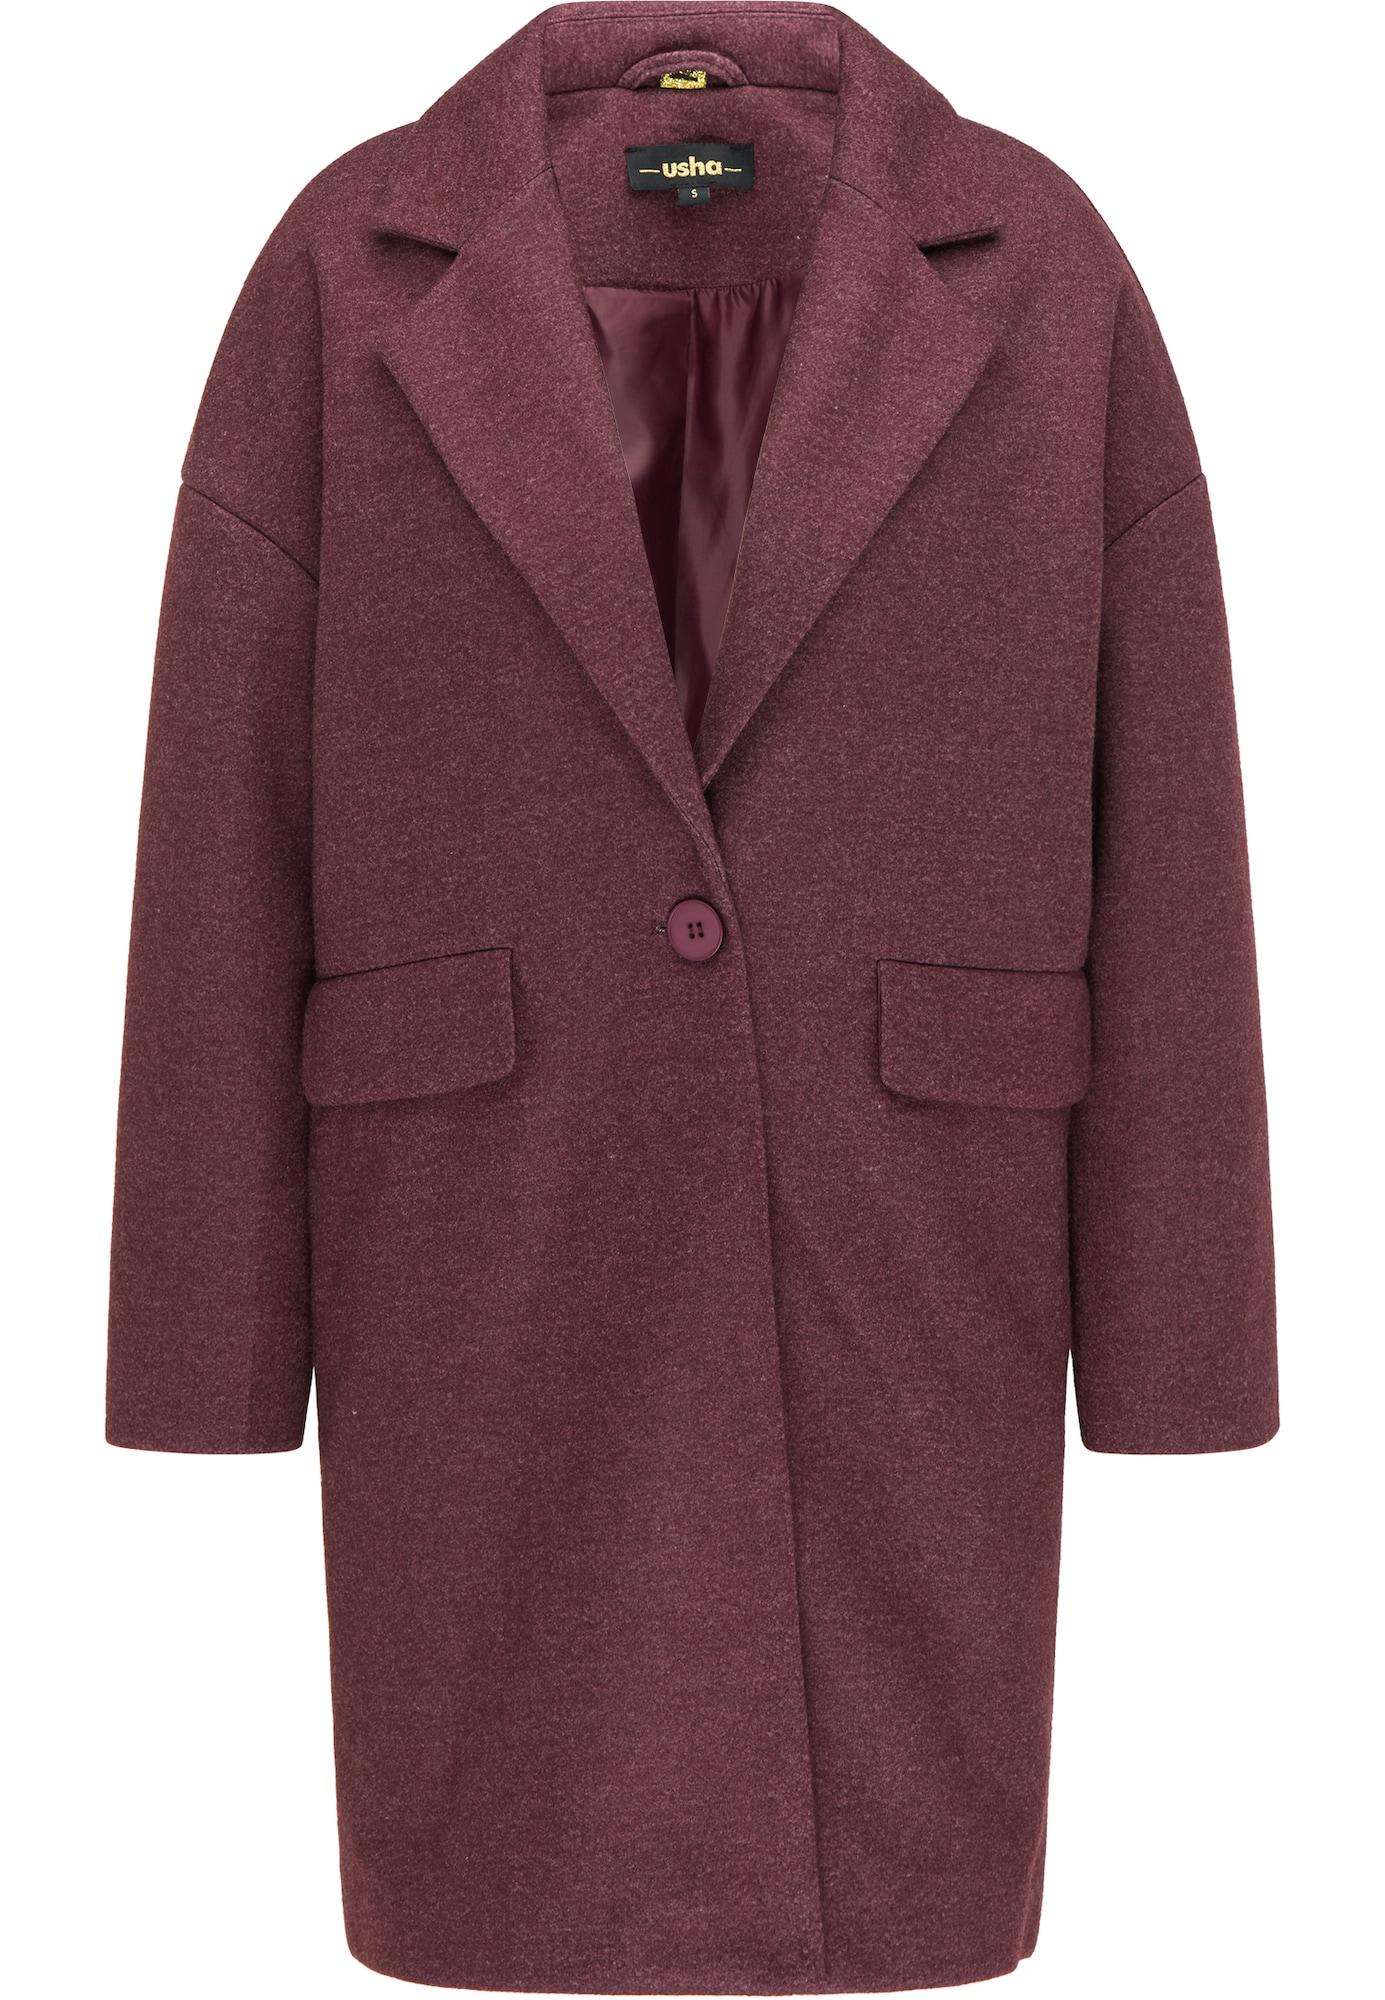 usha BLACK LABEL Demisezoninis paltas raudonai violetinė